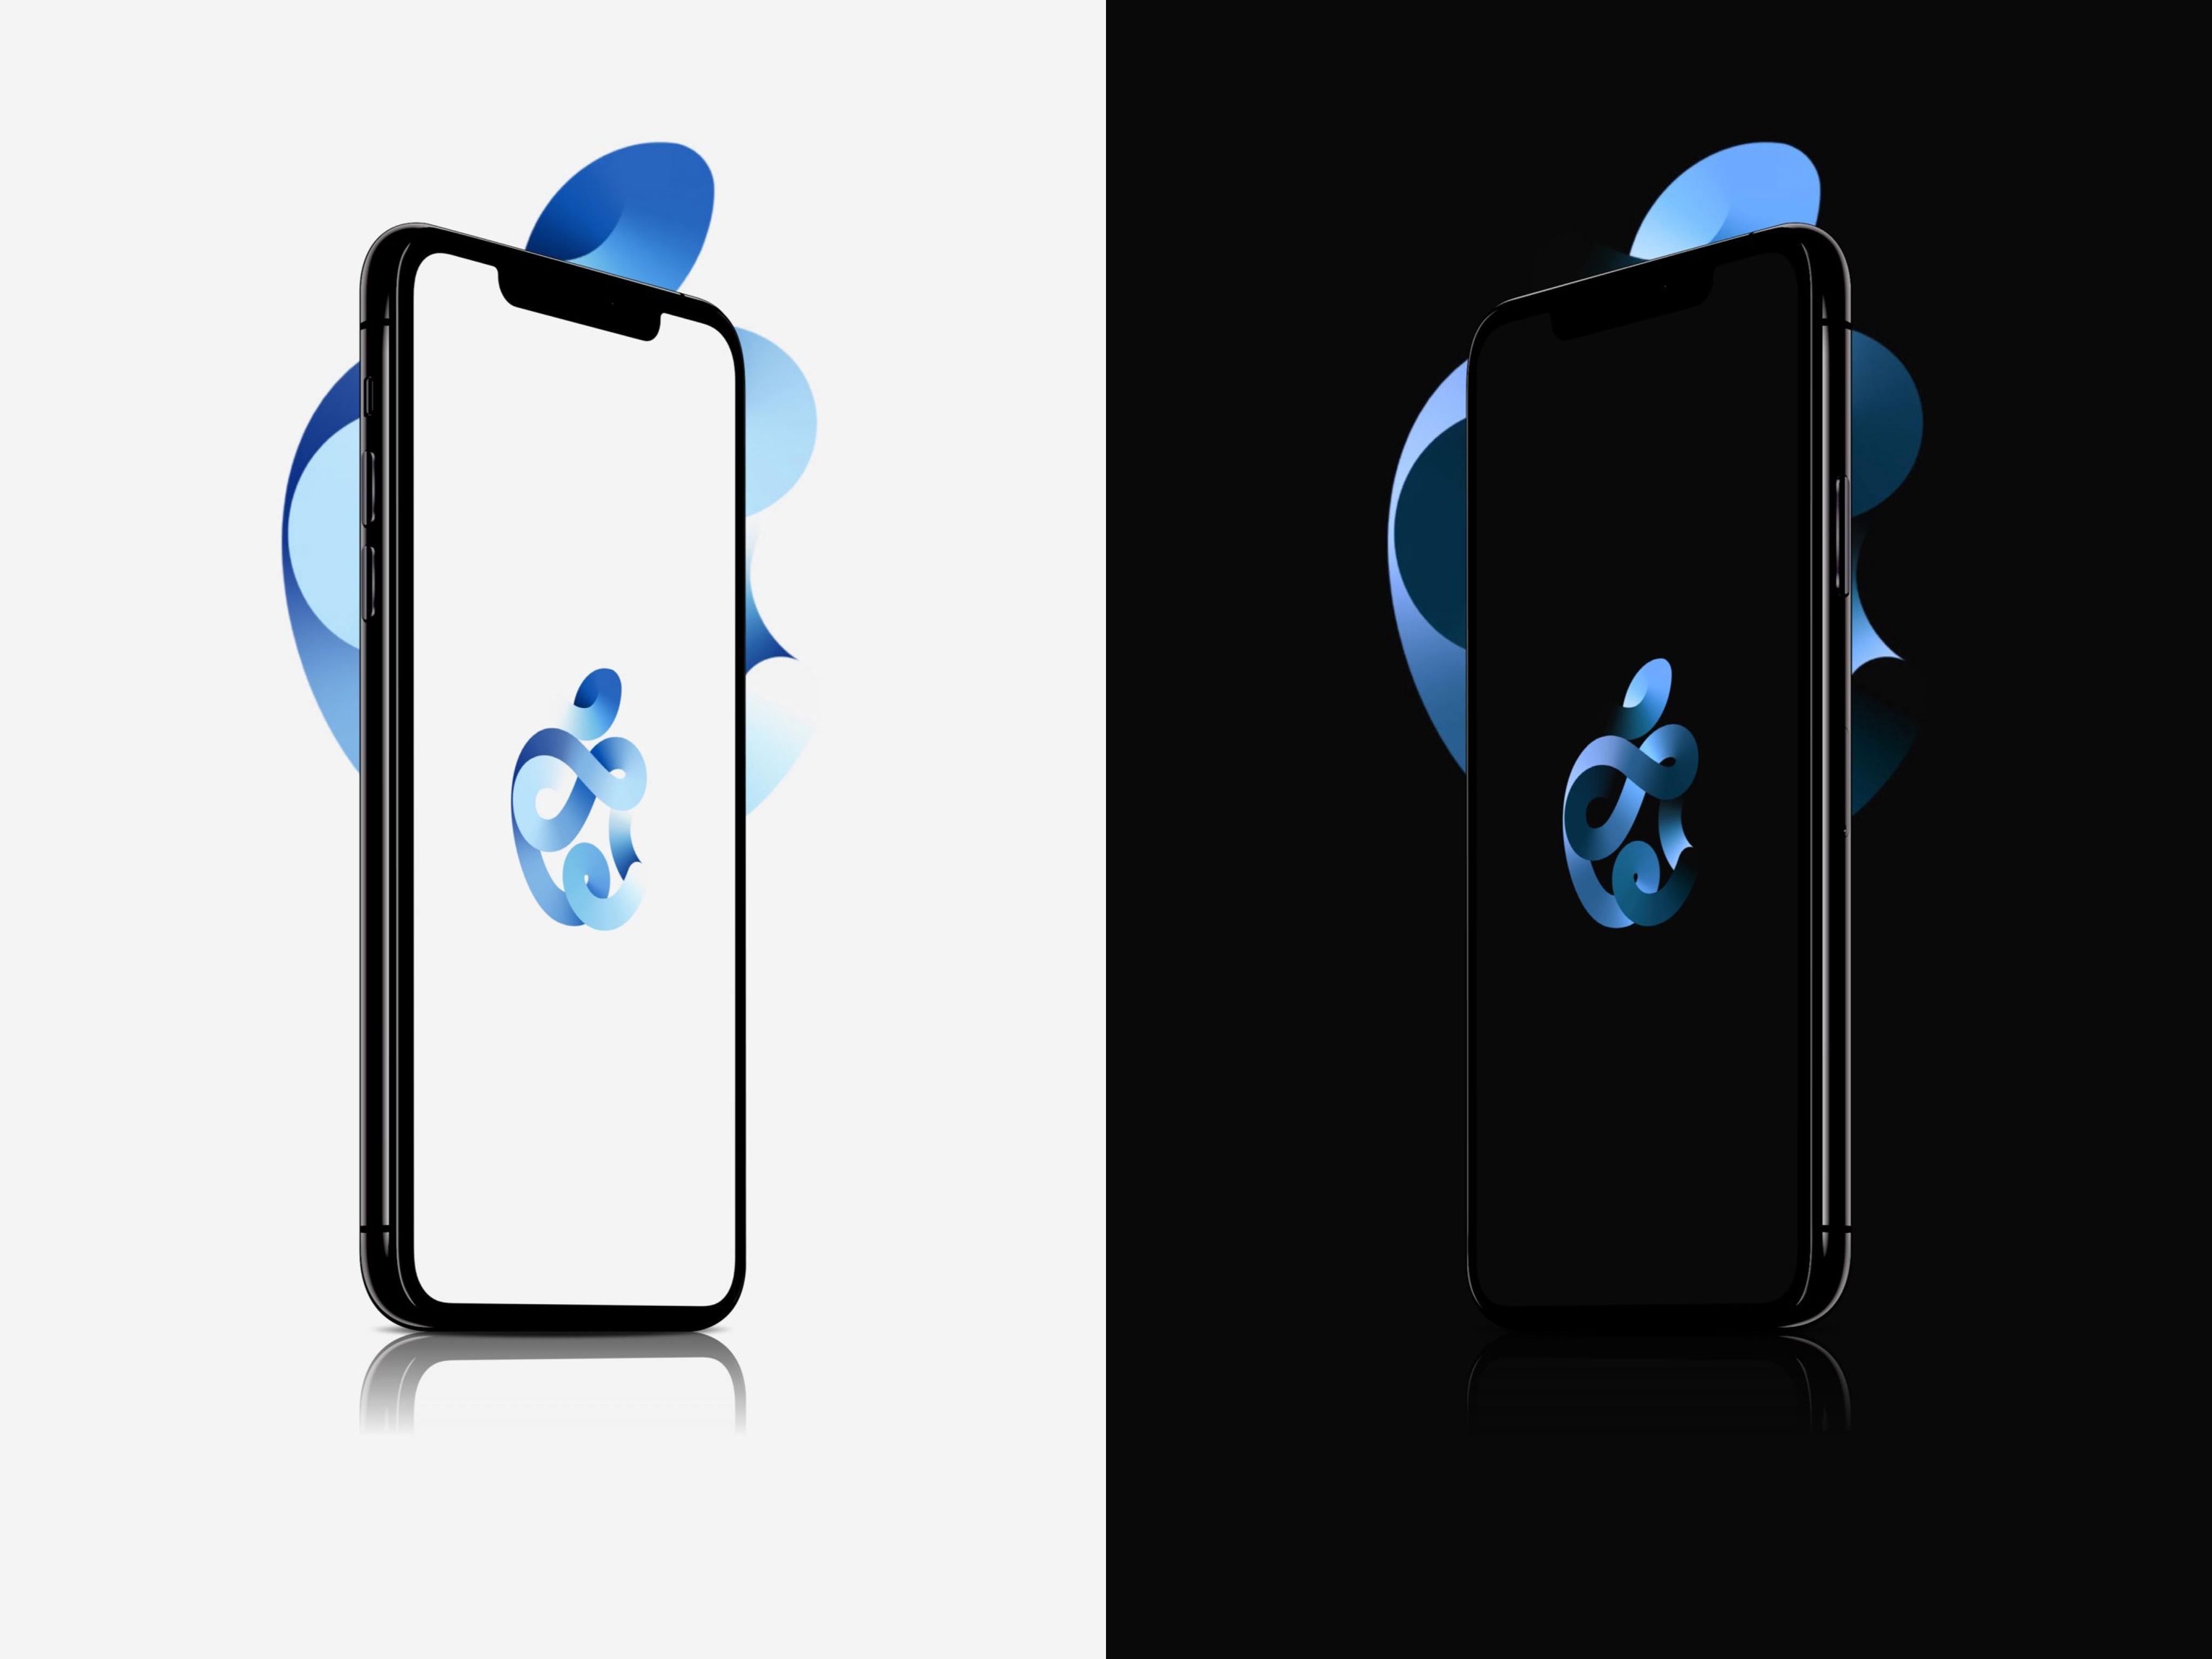 Tường thuật sự kiện Apple - iPhone 12 vẫn